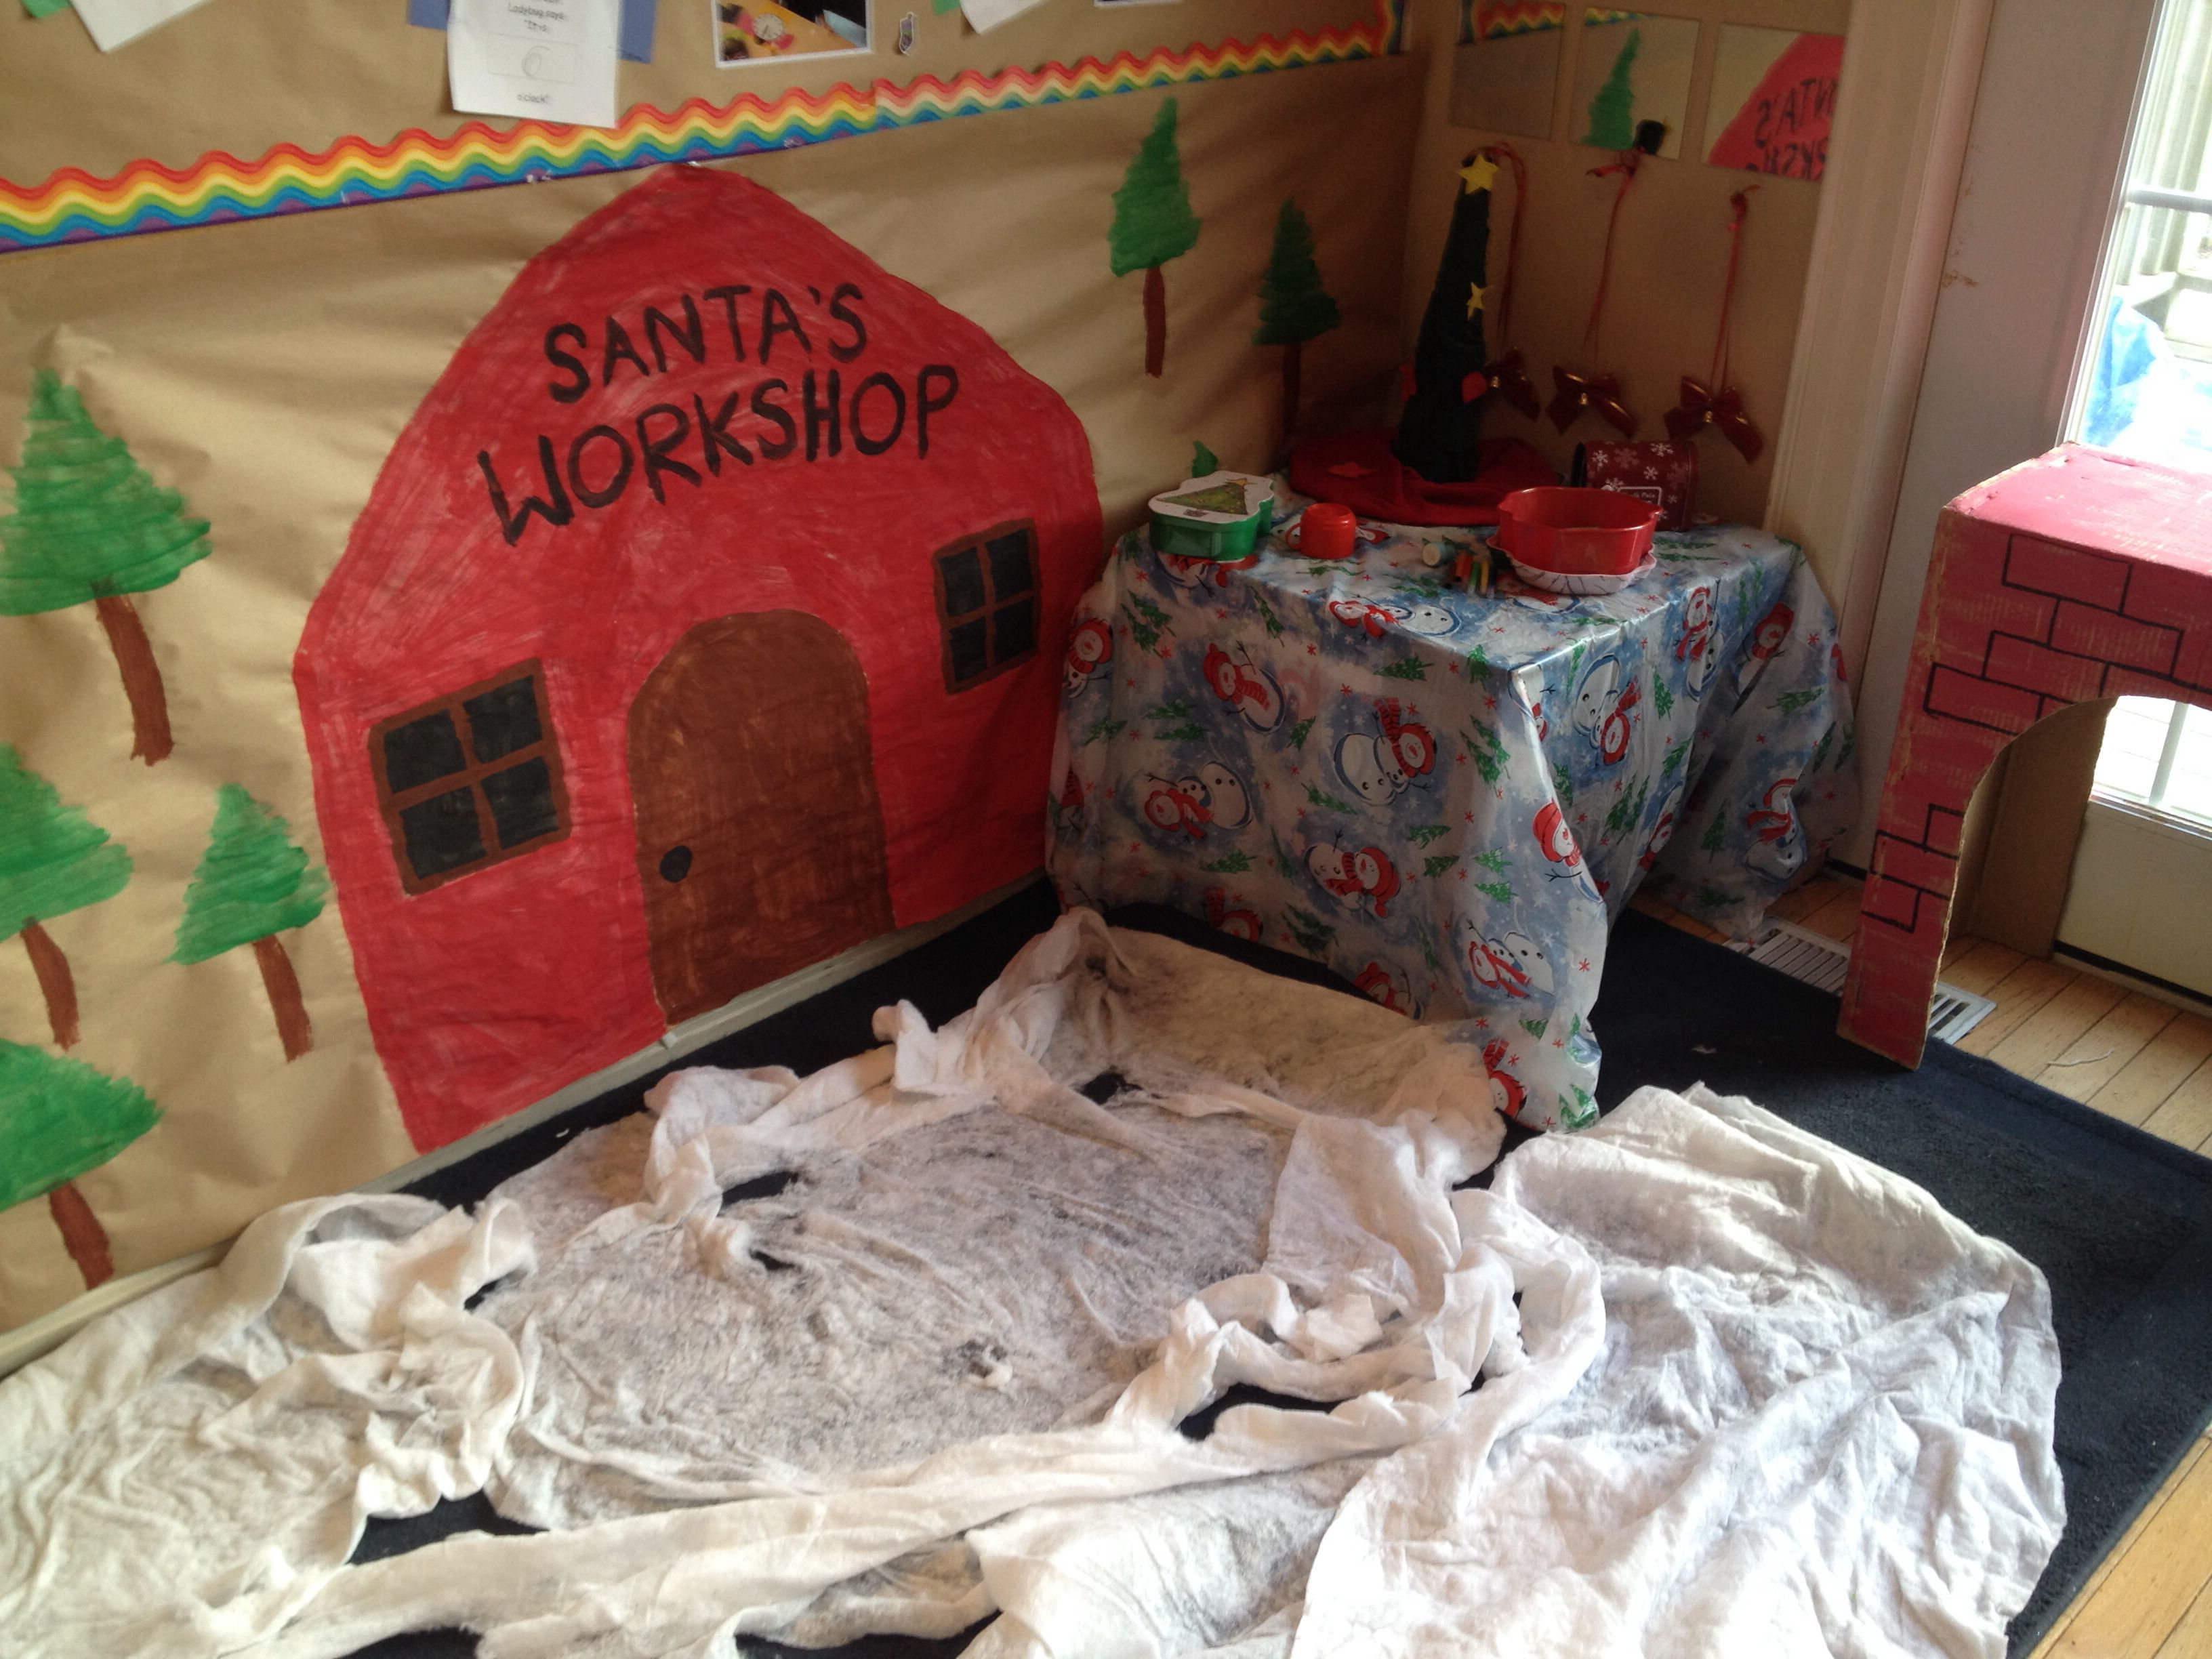 Kindergarten Santa's Workshop (Dramatic Play Centre)